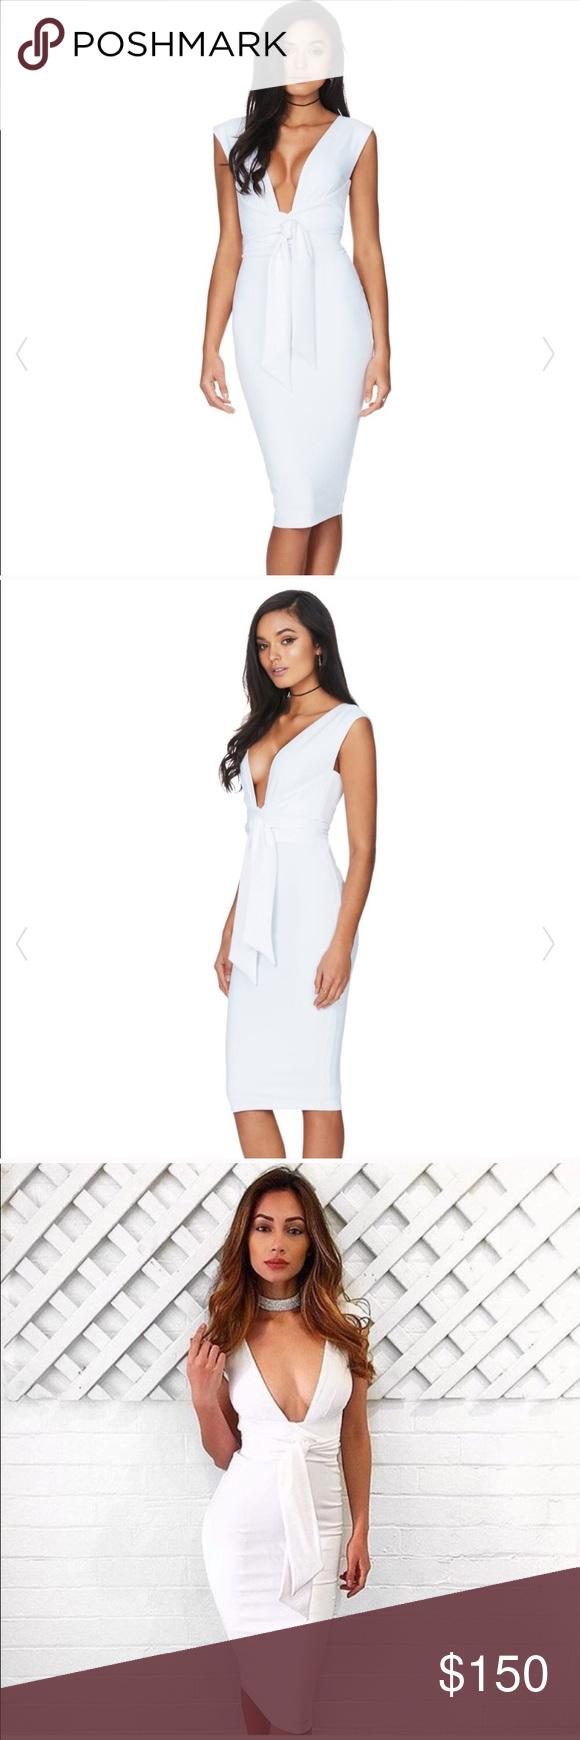 Nookie White Royal Midi S Clothes Design Outfits Dresses [ 1740 x 580 Pixel ]